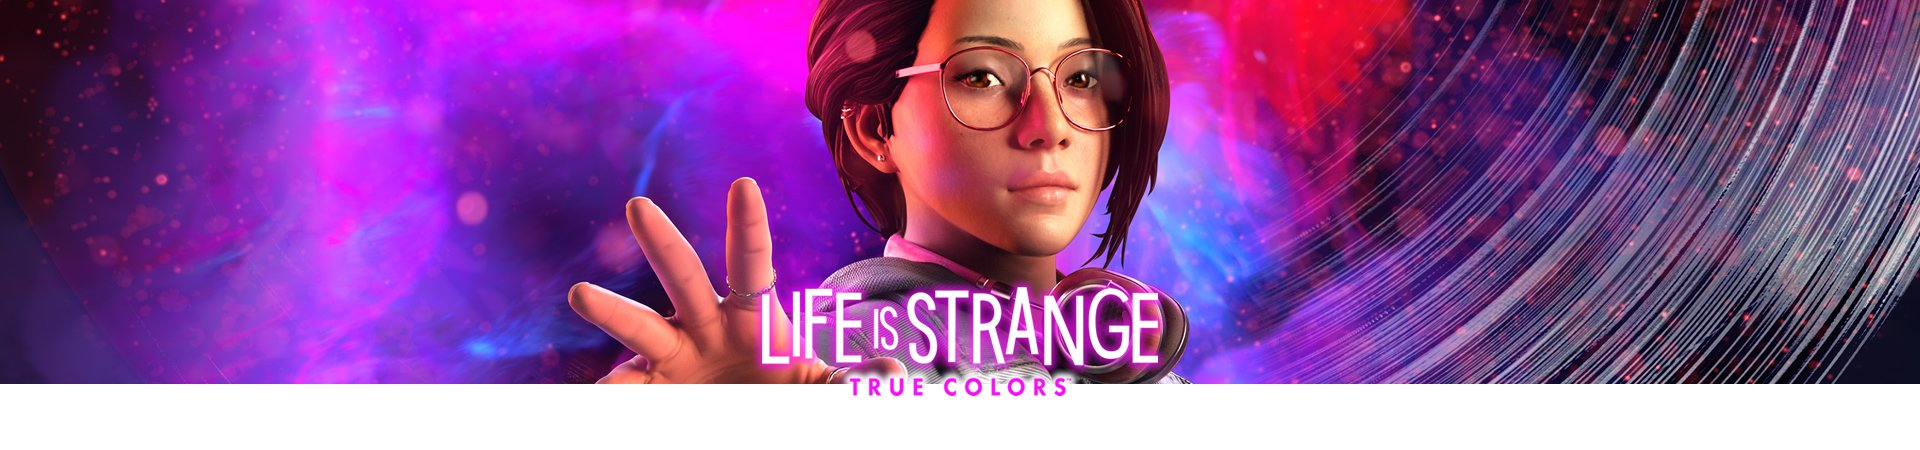 Game Life is Strange True Colors